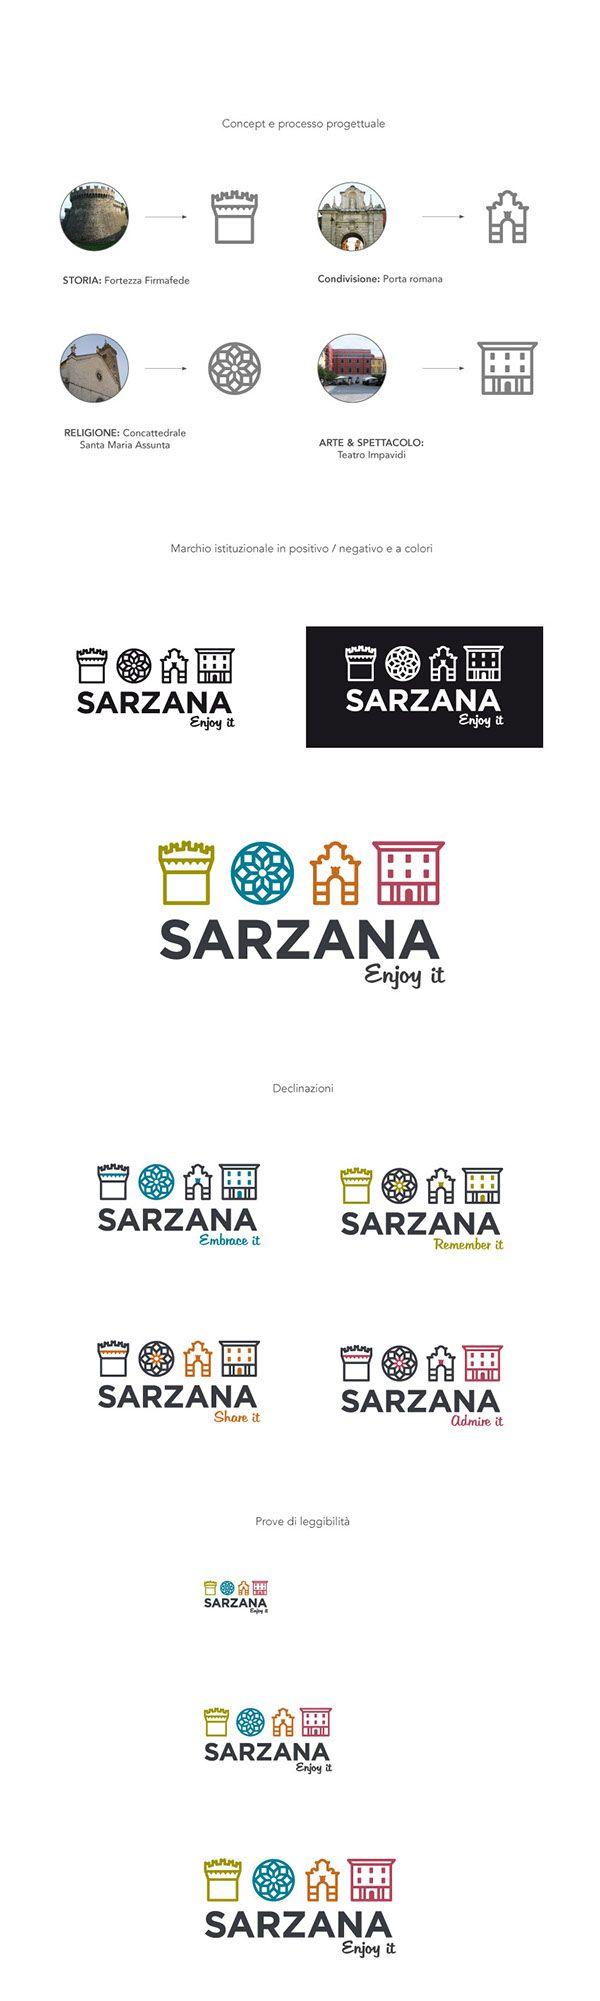 #city #branding